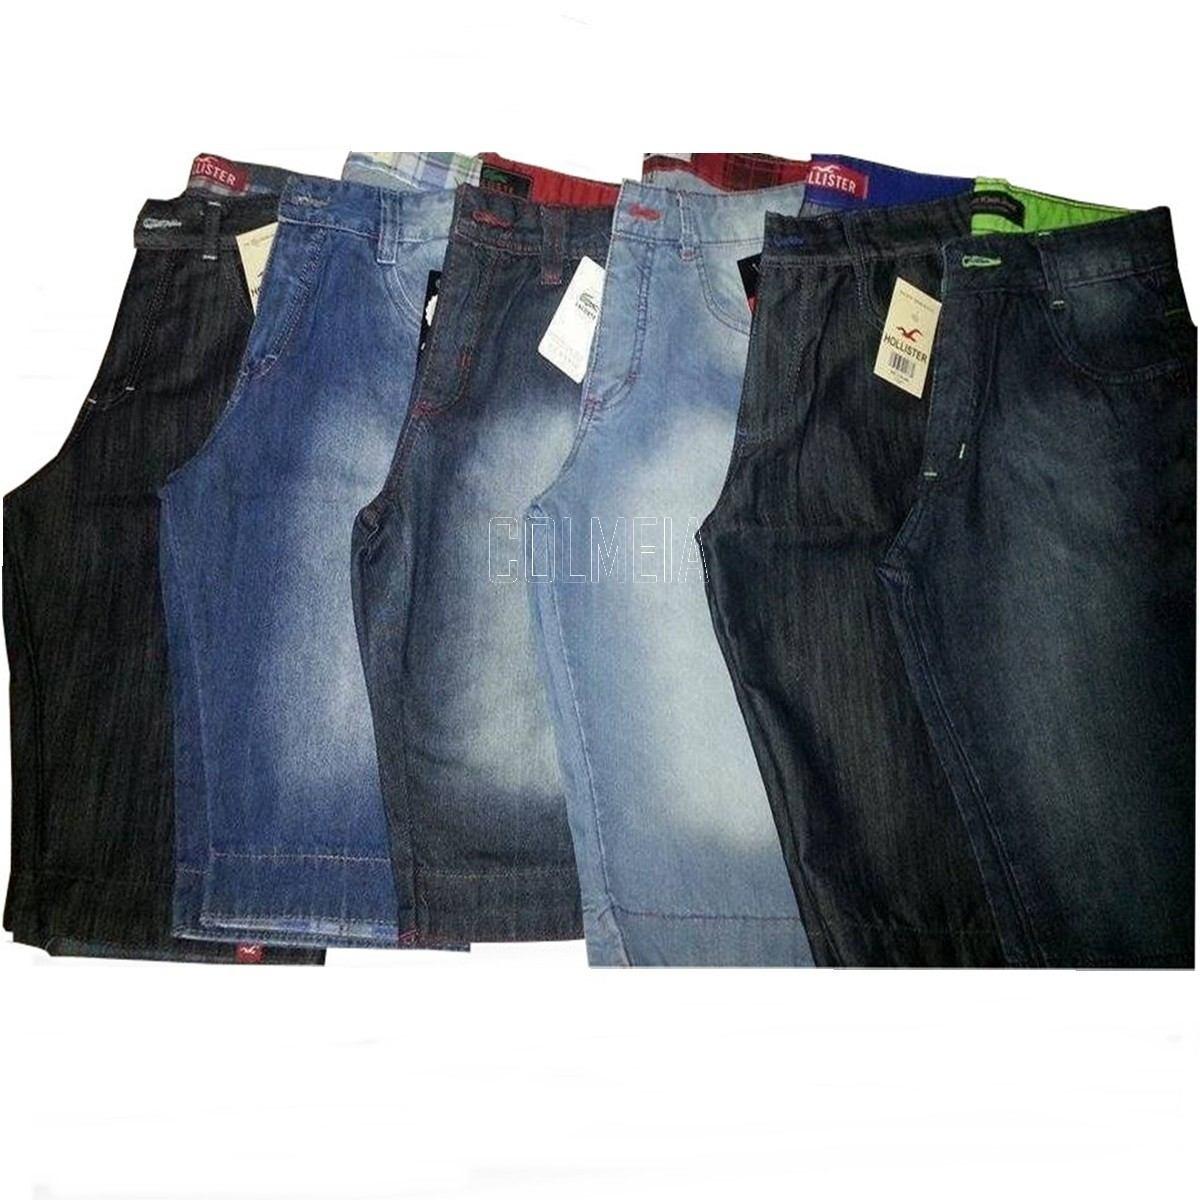 Kit C/ 40 Bermudas Jeans Masculina Diversas Marcas